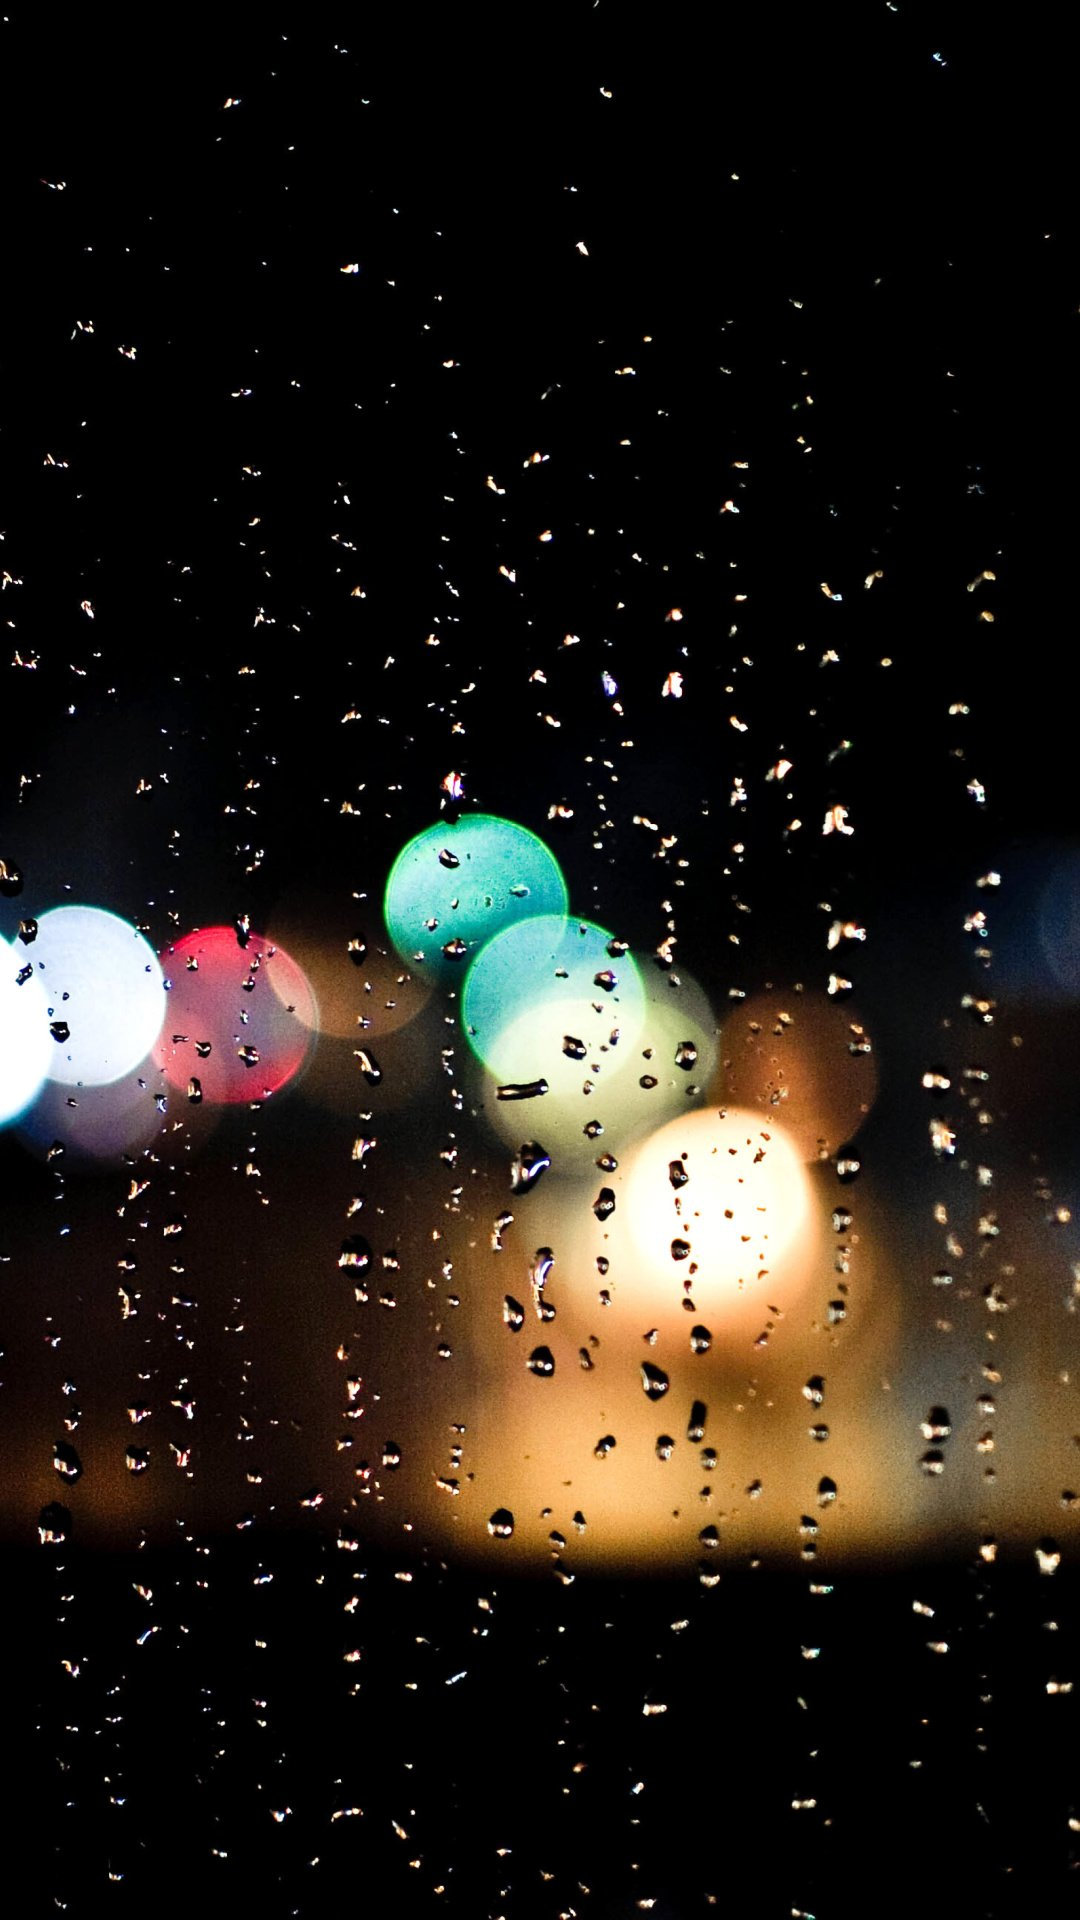 Rain HD wallpaper for mobile